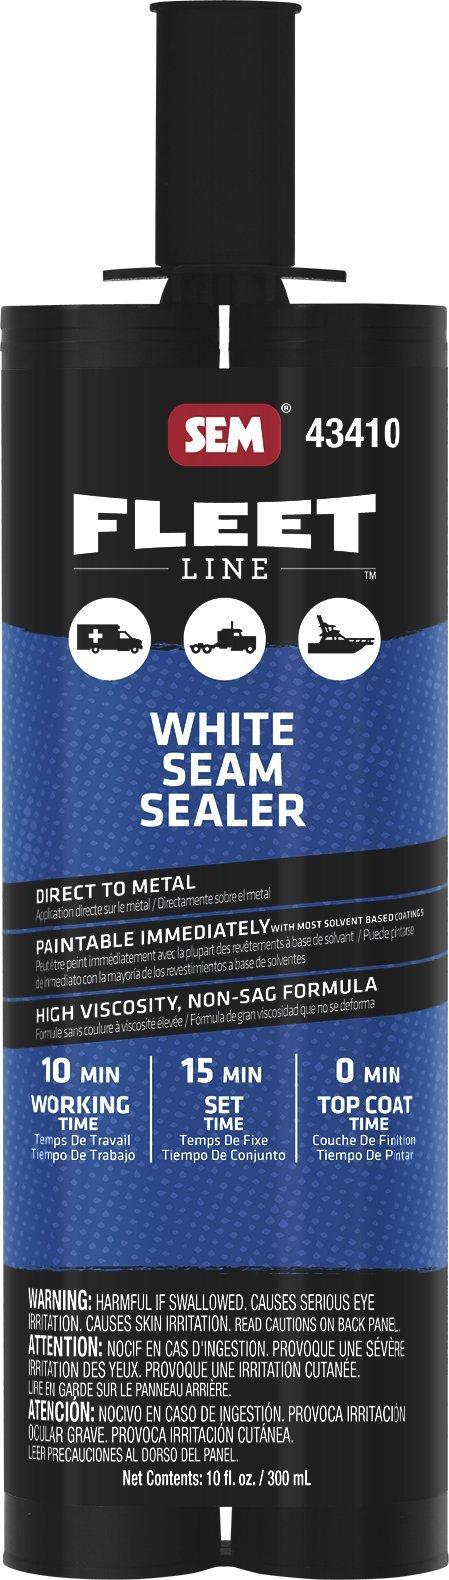 SEM 43410 White Seam Sealer, 10 oz.